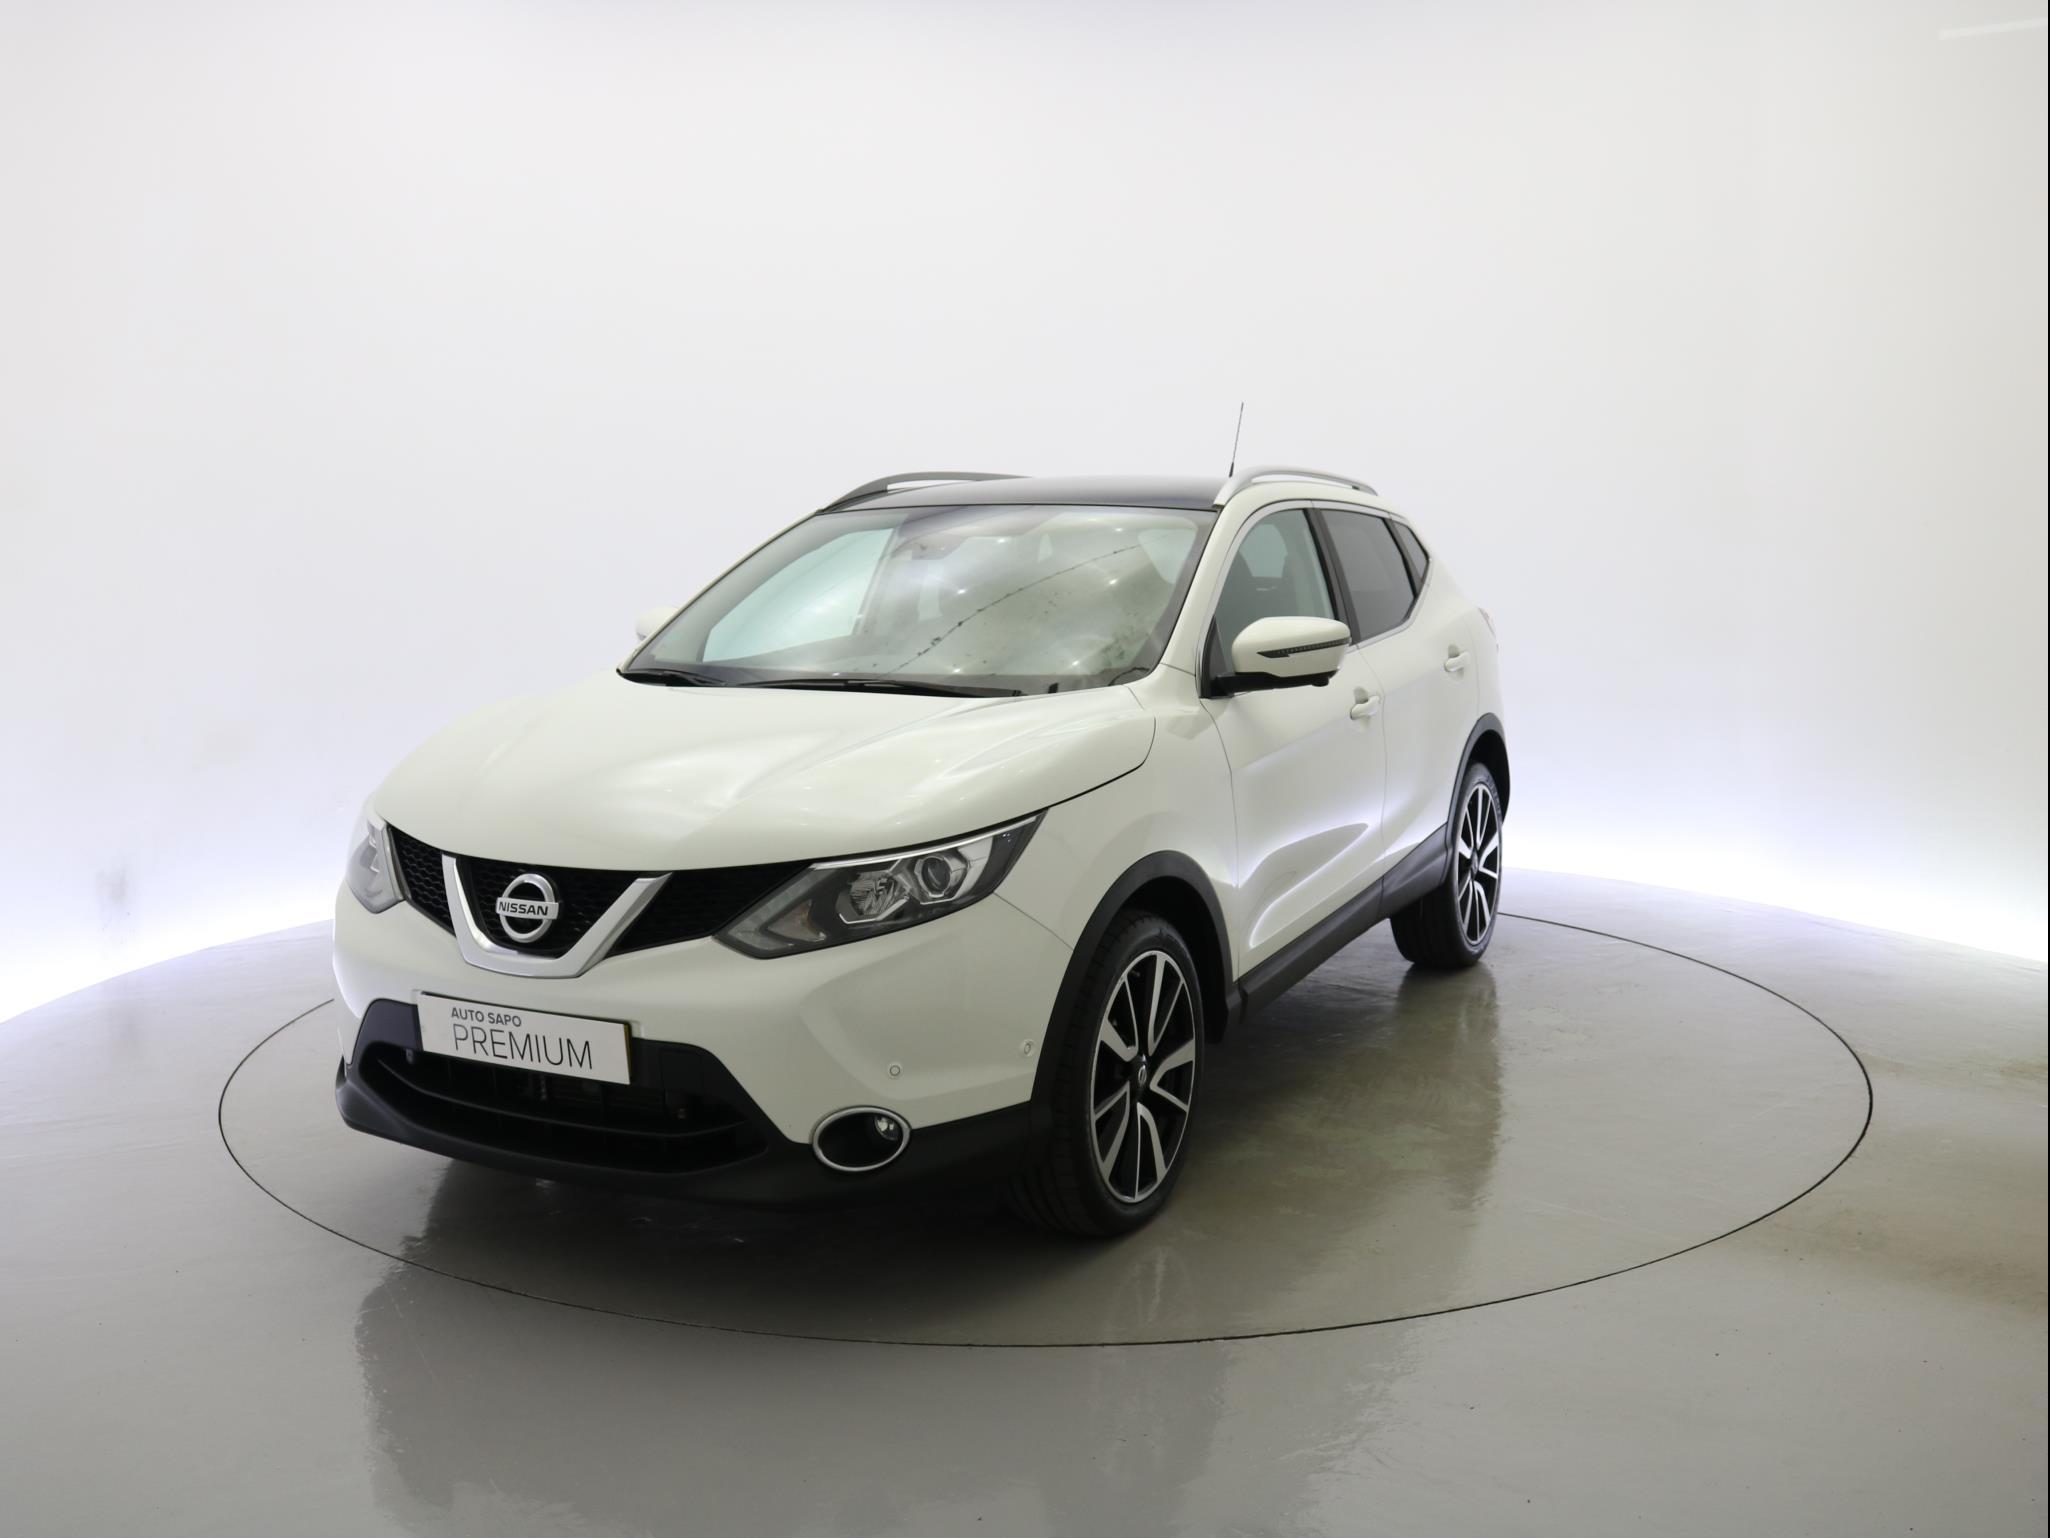 Nissan Qashqai 1.2 DIG-T XTRONI Tekna Premium Pele